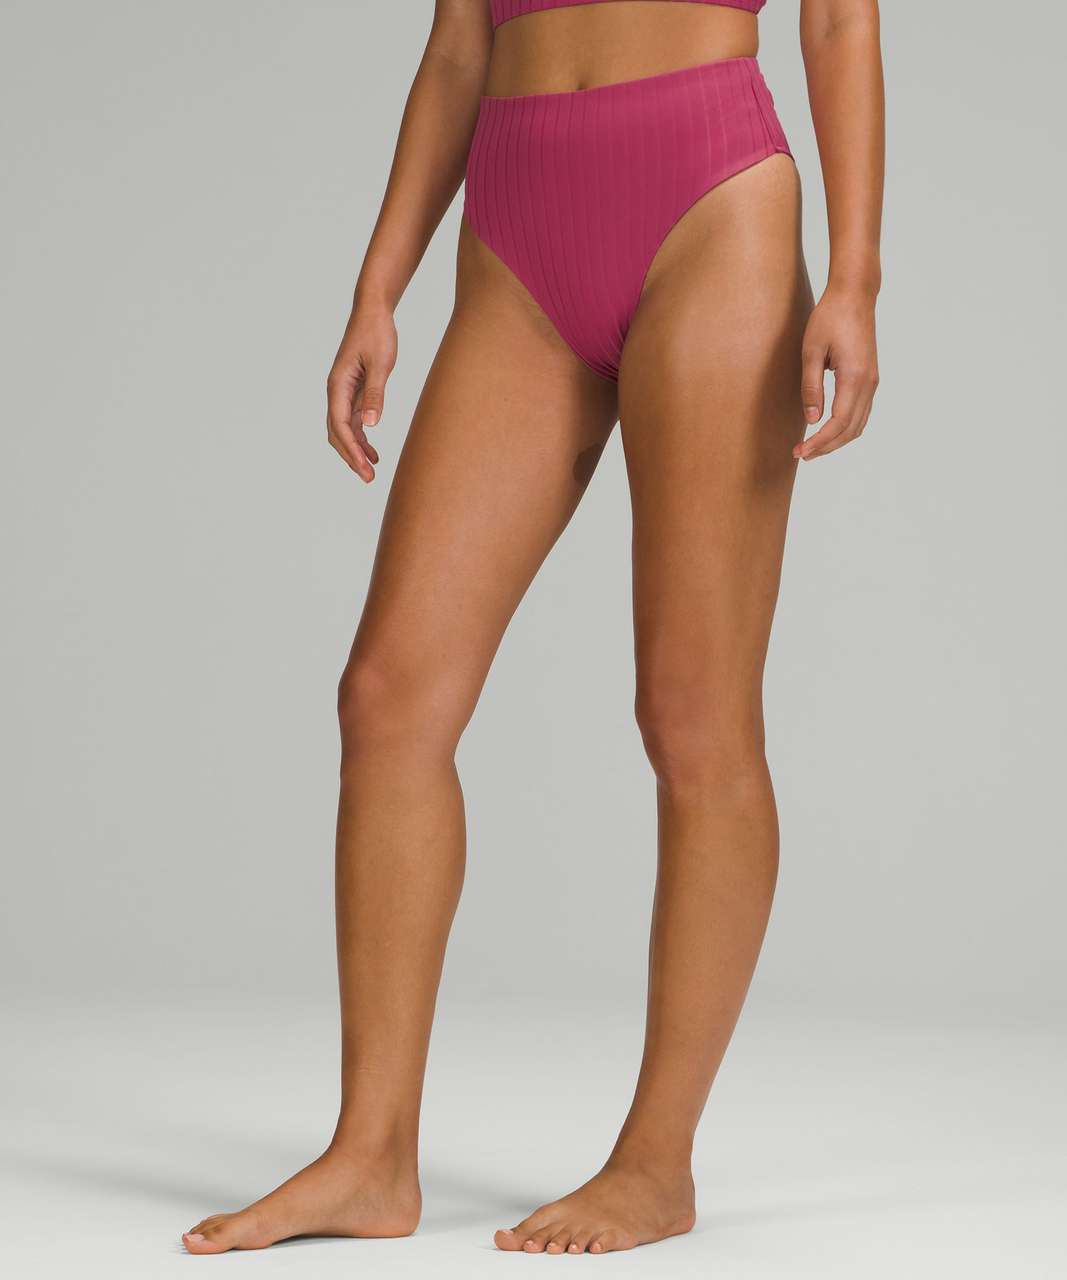 Lululemon Ribbed High-Waist Extra-Skimpy Swim Bottom - Pink Lychee